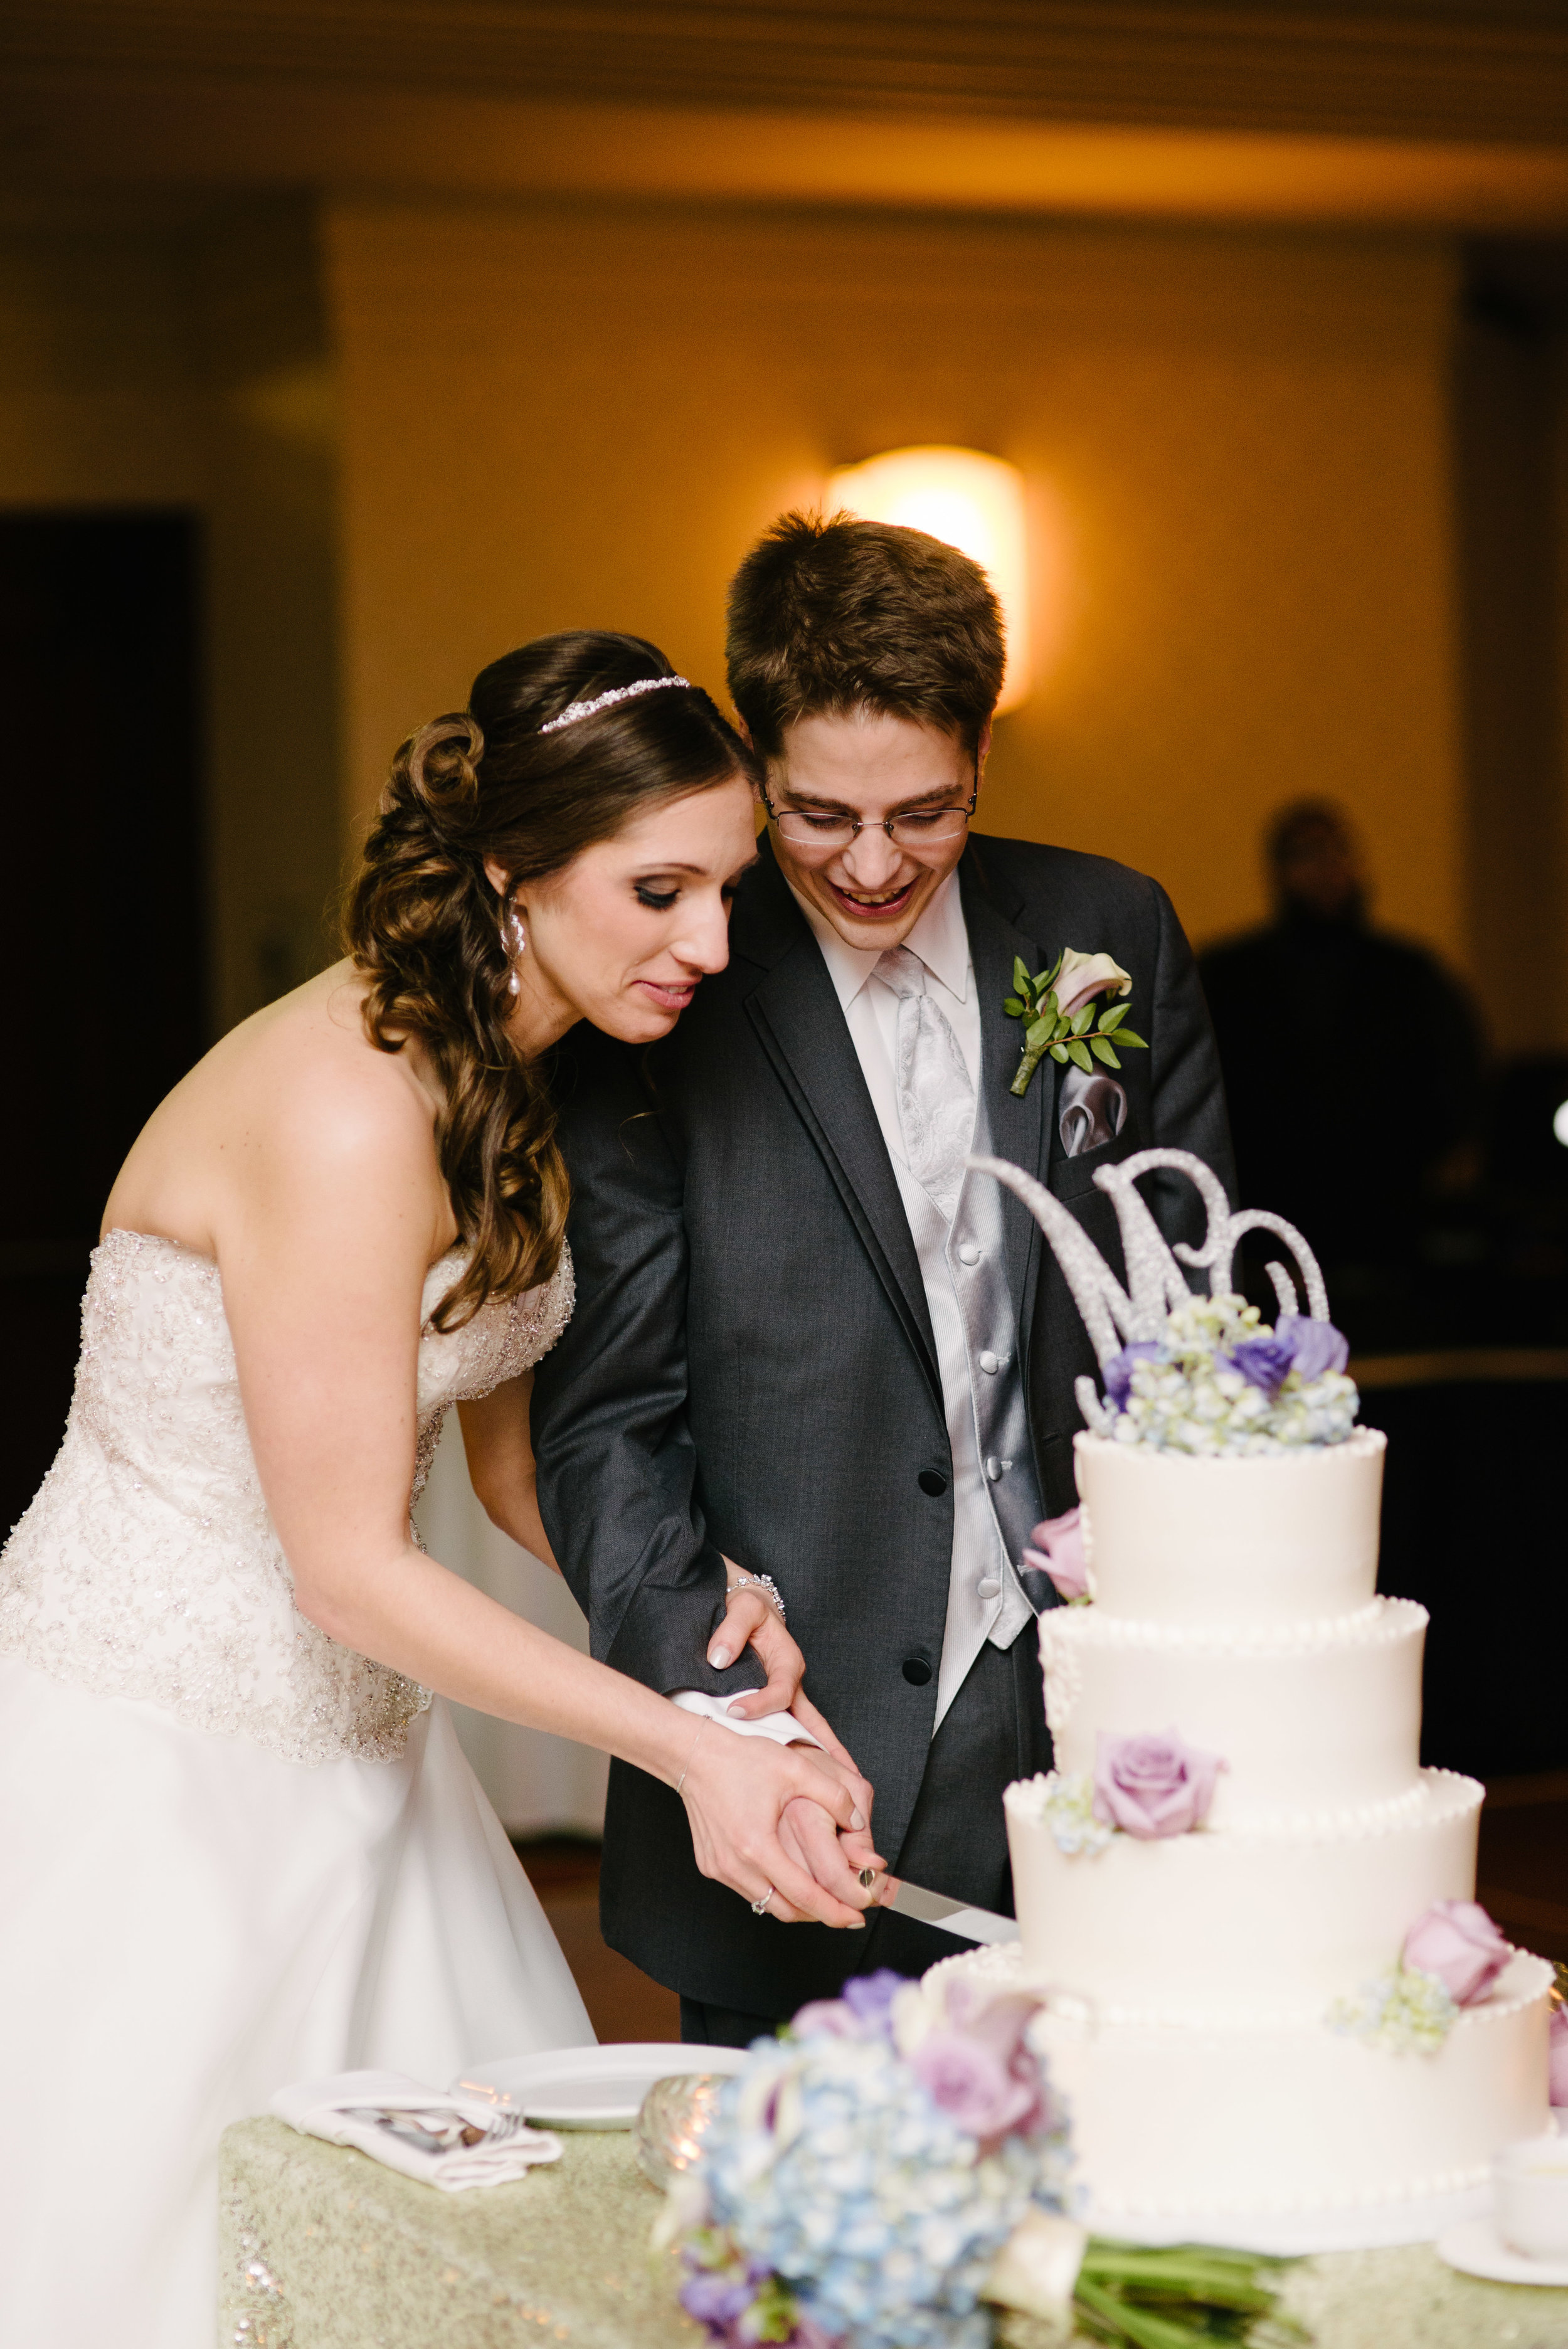 Cake cutting ballroom reception // The Miner Details weddings